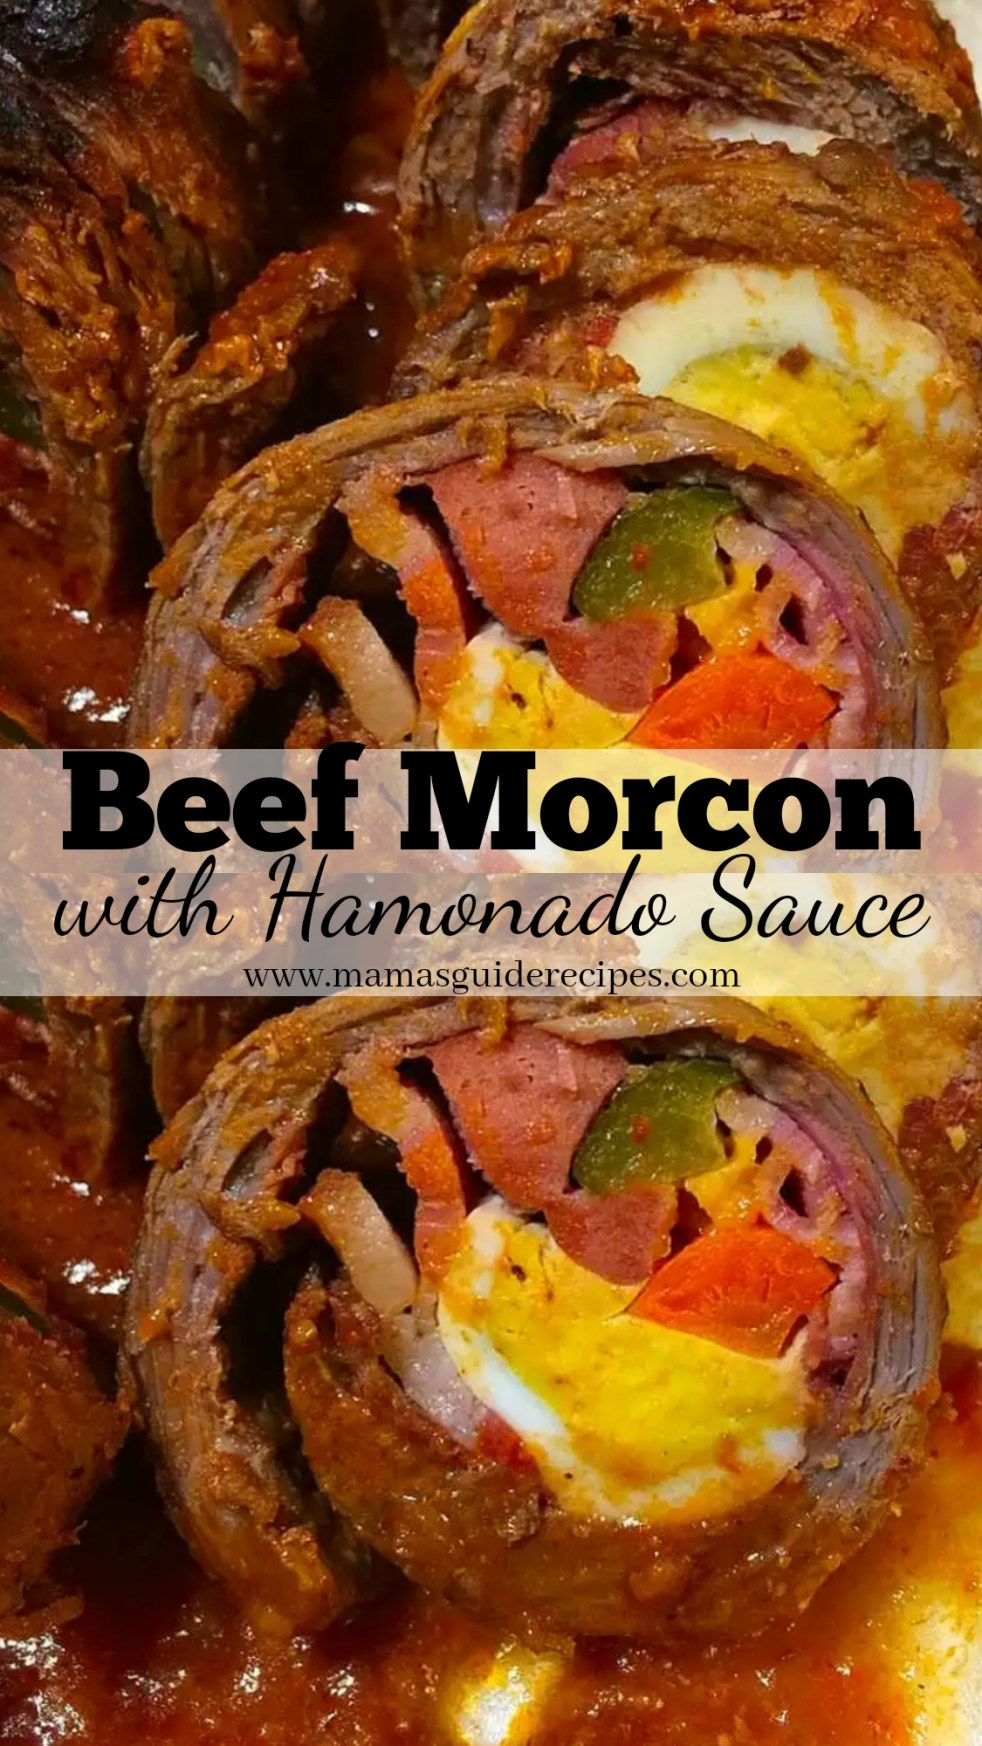 Beef Morcon with Hamonado Sauce